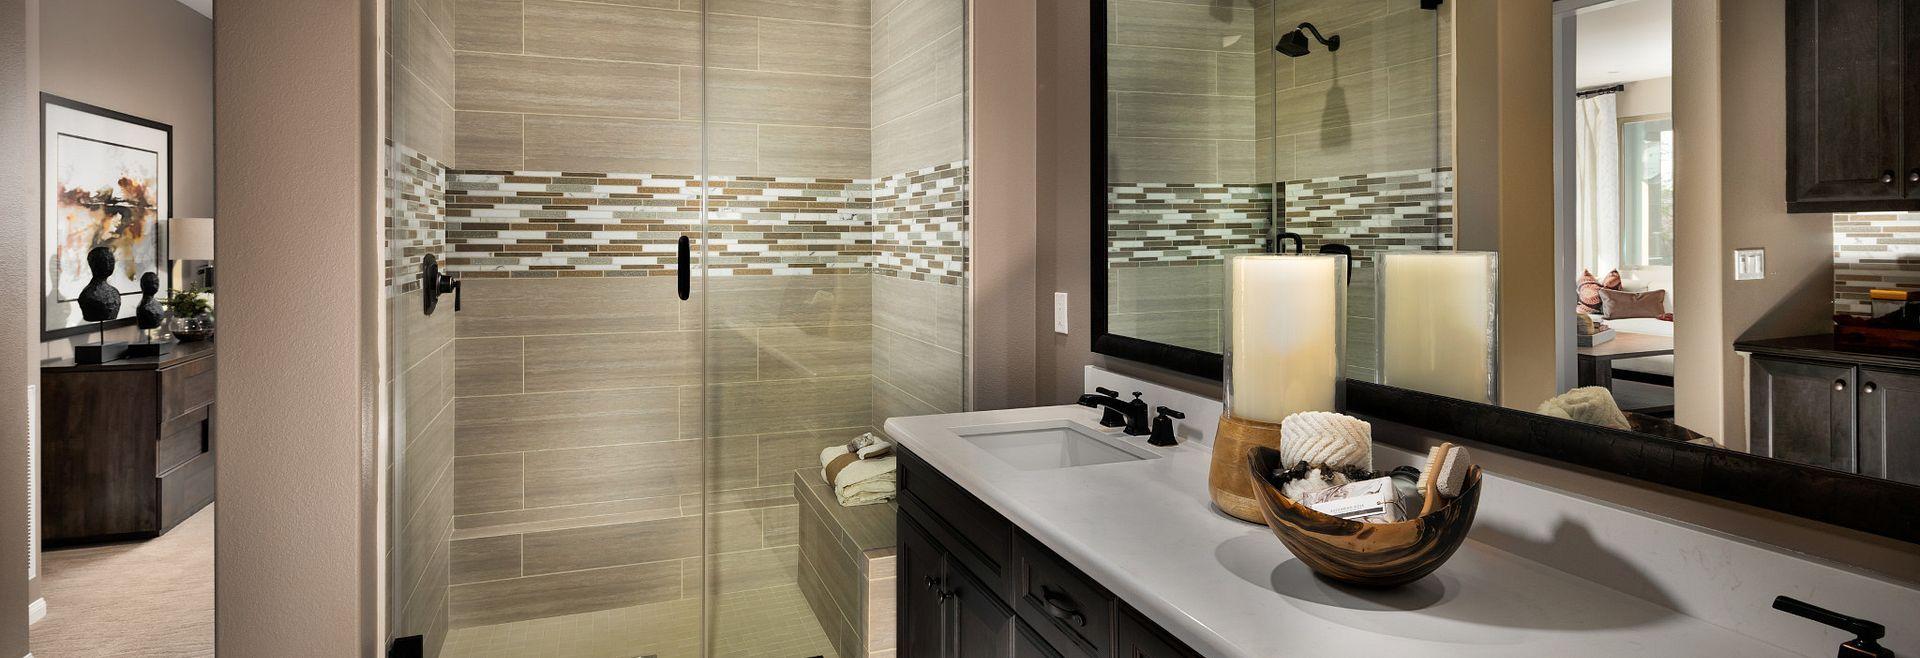 Bathroom featured in the Muros By Shea Homes - Trilogy in Phoenix-Mesa, AZ